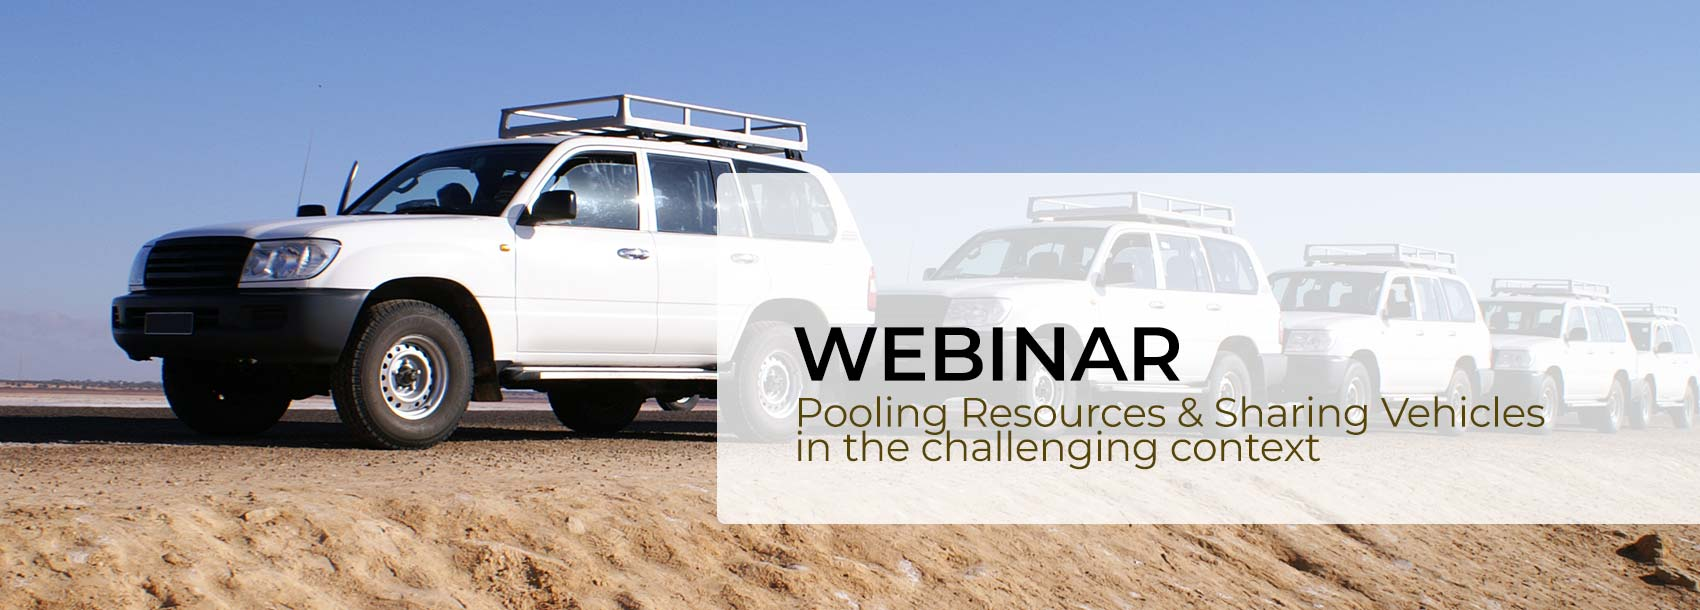 HumaNav webinar banner : pooling resources & sharing vehicles